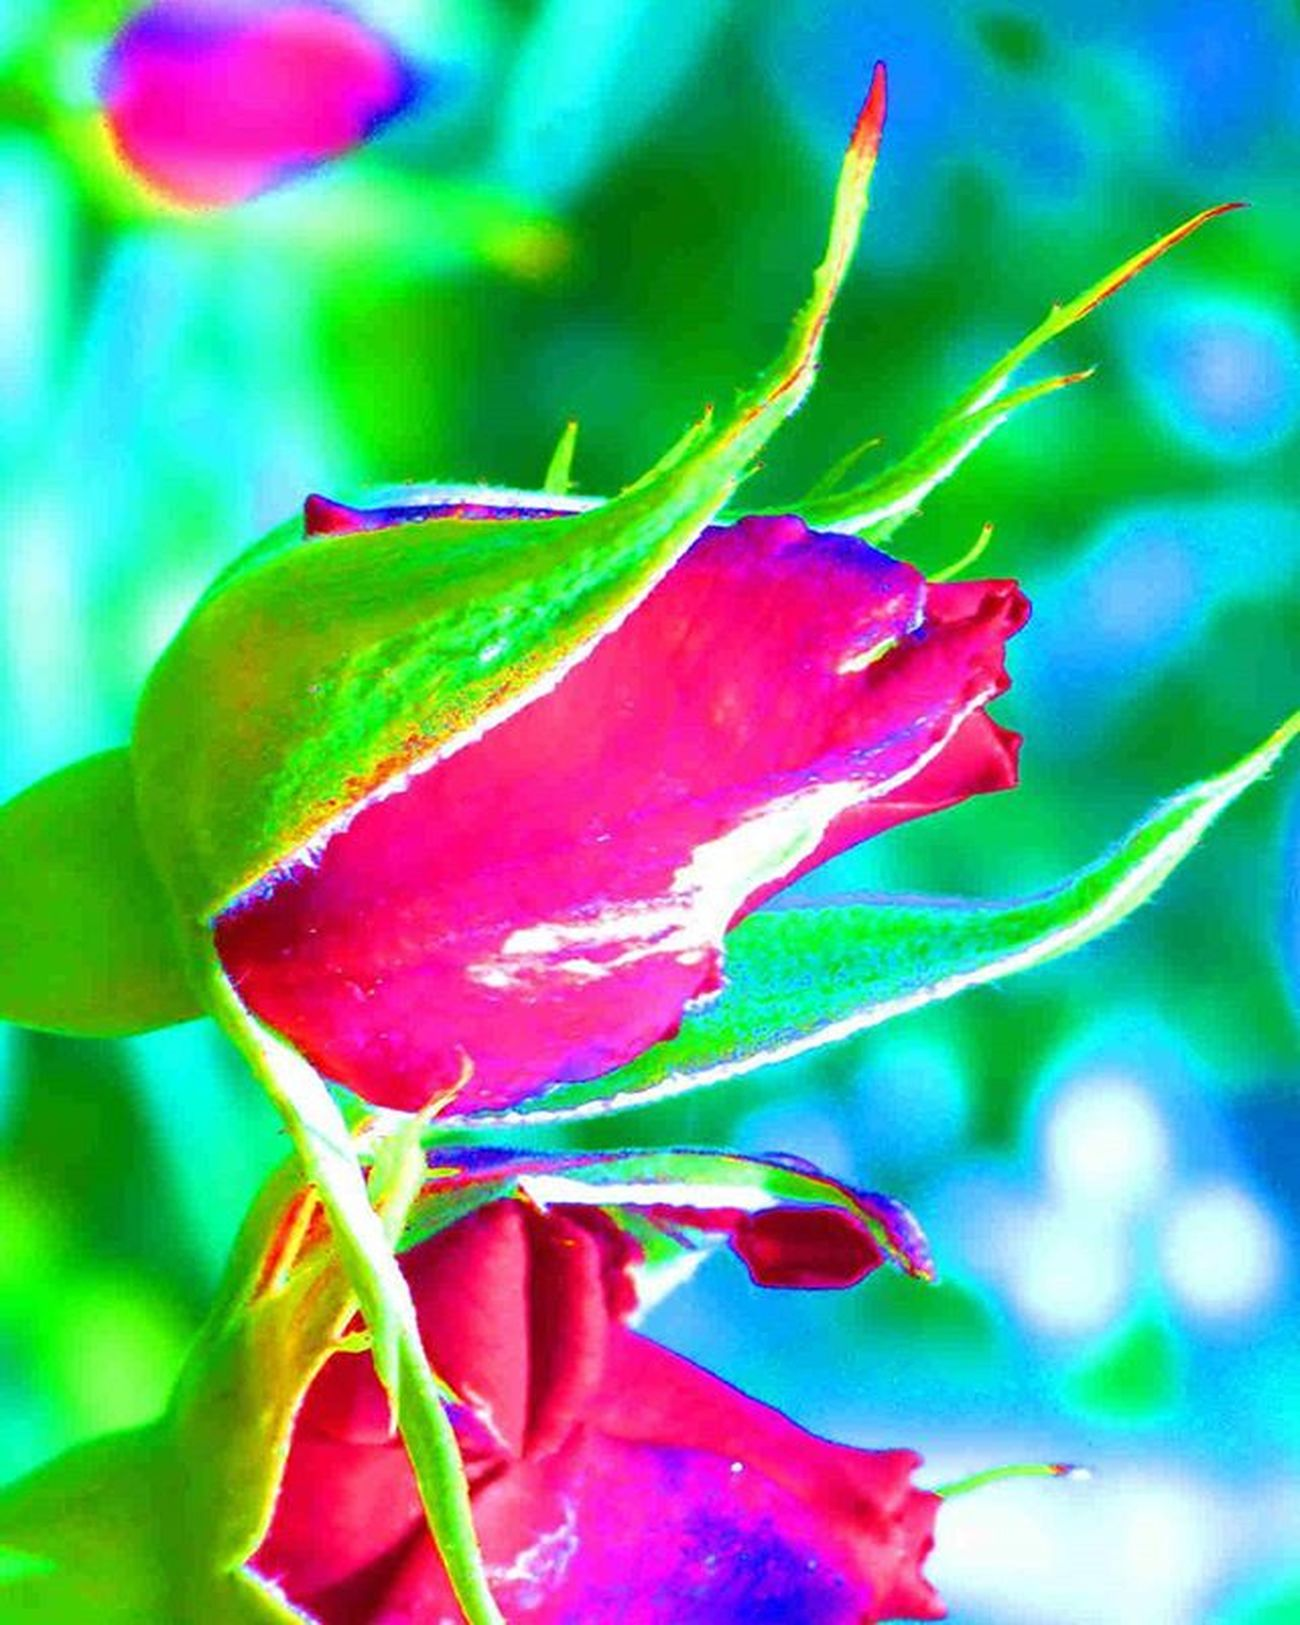 Roses blooming 😀 1) Macro_brilliance 2) Dof_brilliance 3) Ig_affair_weekly 4) Small_world_upclose 5) Ig_affair_macro 6) Macrongawi 7) Sn_may2 8) Mta_macro 9) Af_macro 0) Macroclique 1) Kings_hubs 2) Pocket_family 3) Igglobalclubmacro 4) My_daily_macro 5) Fotofanatics_alltags_ 6) Total_macro 7) Flowersandmacro 8) Macroparadise 9) Wms_macro 0) Photoflair_macro 1) Bpa_macro 2) Macroaddictsanonymous 3) Jabrmacro 4) Tv_closeup 5) 9vaga_flowersart9 6) macroworld_tr 7) ptk_macro 8) 9vaga_macro9 9) ig_closeups 0) ponyfony_flowers